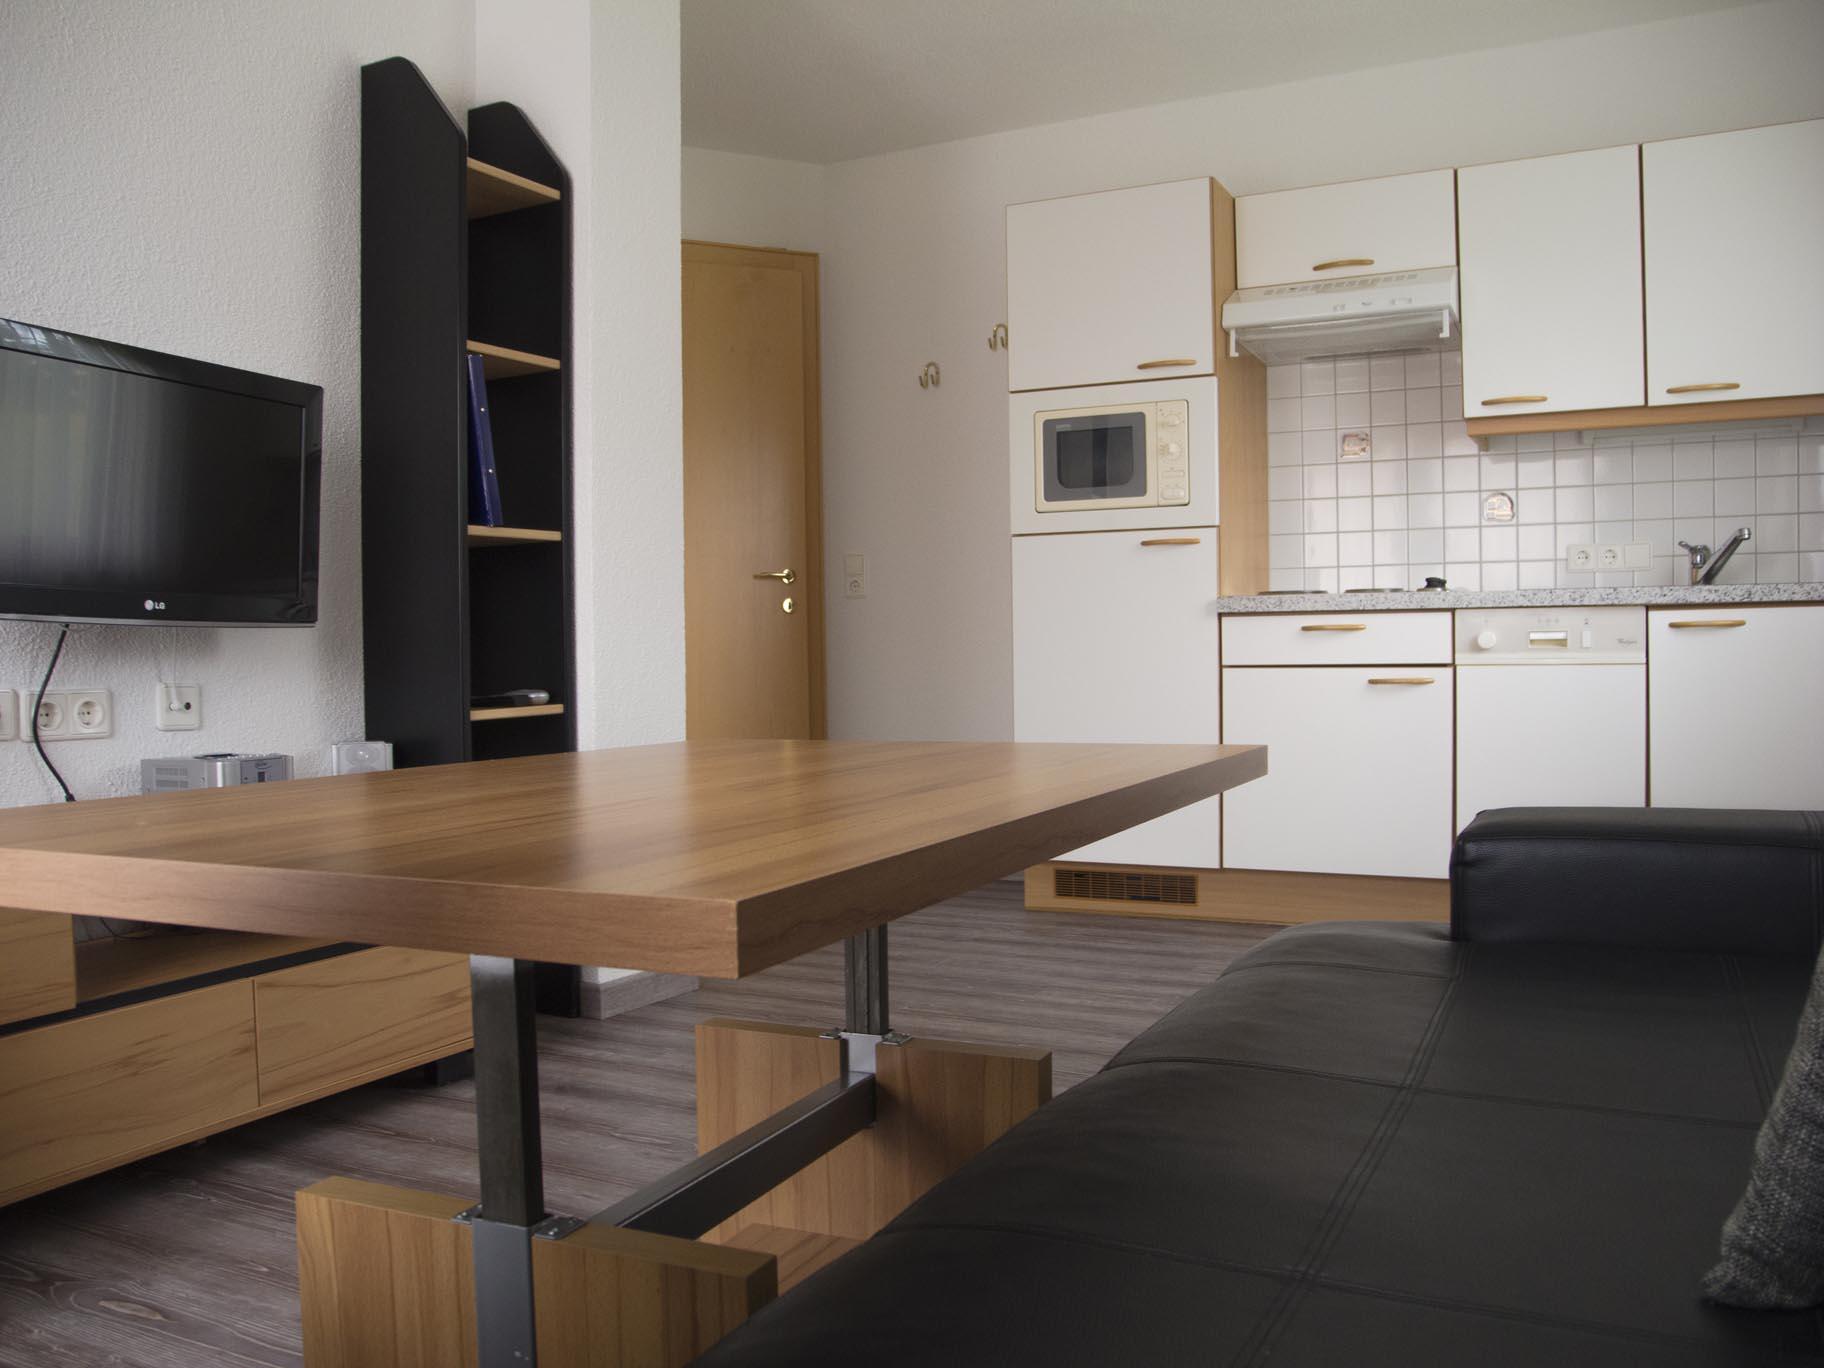 Apartment 1, living room